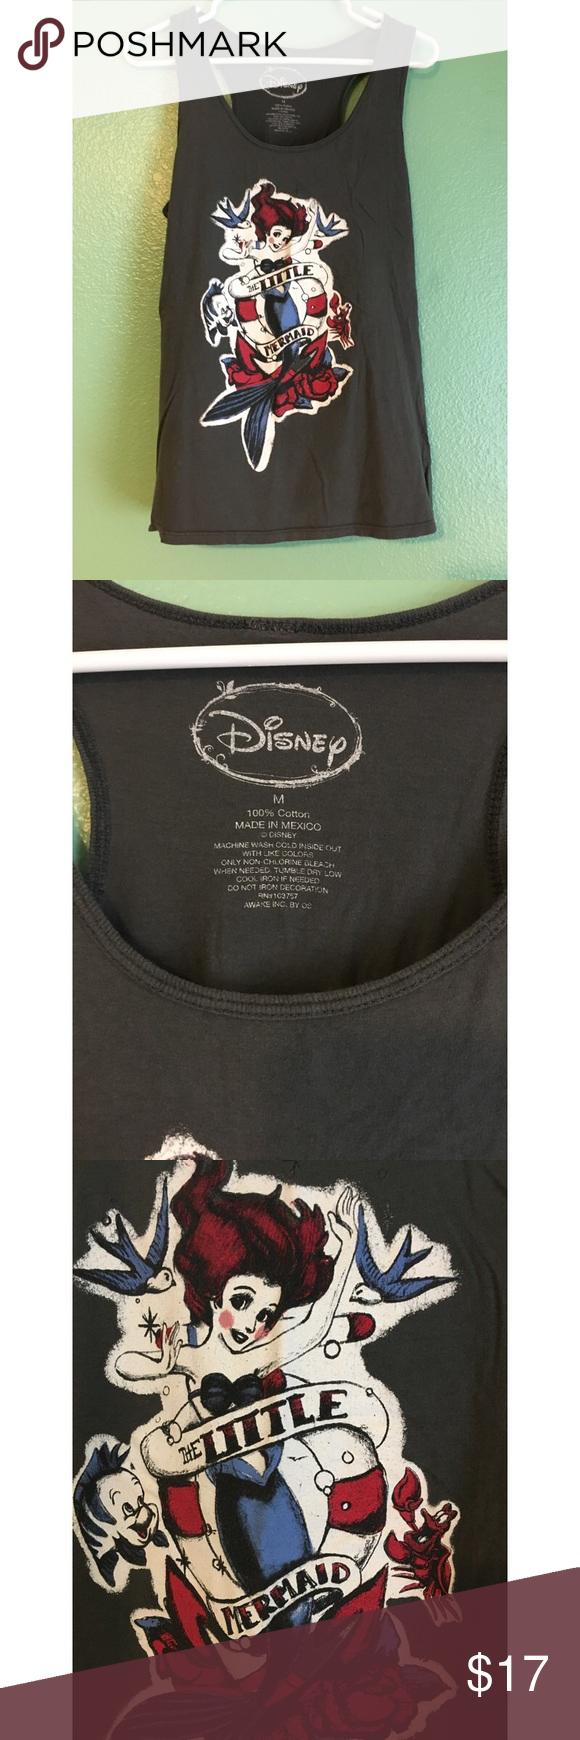 Disney little mermaid tank top American traditional Ariel print • gray tank top • good condition • hot topic brand Disney Tops Tank Tops